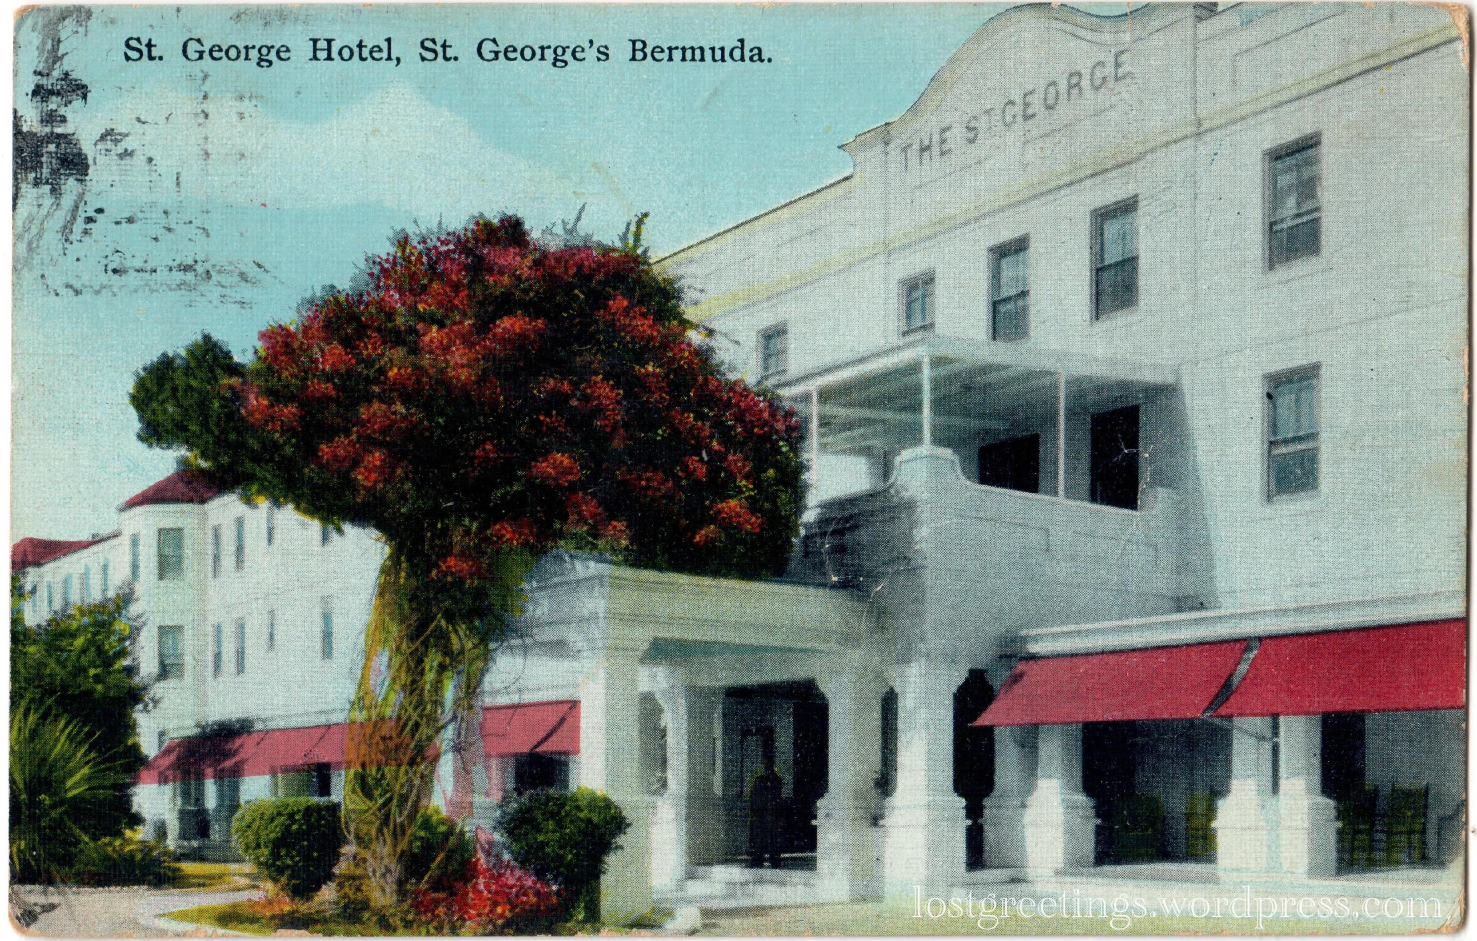 St George's, Bermuda APO 802 - 1941 Postcard lg